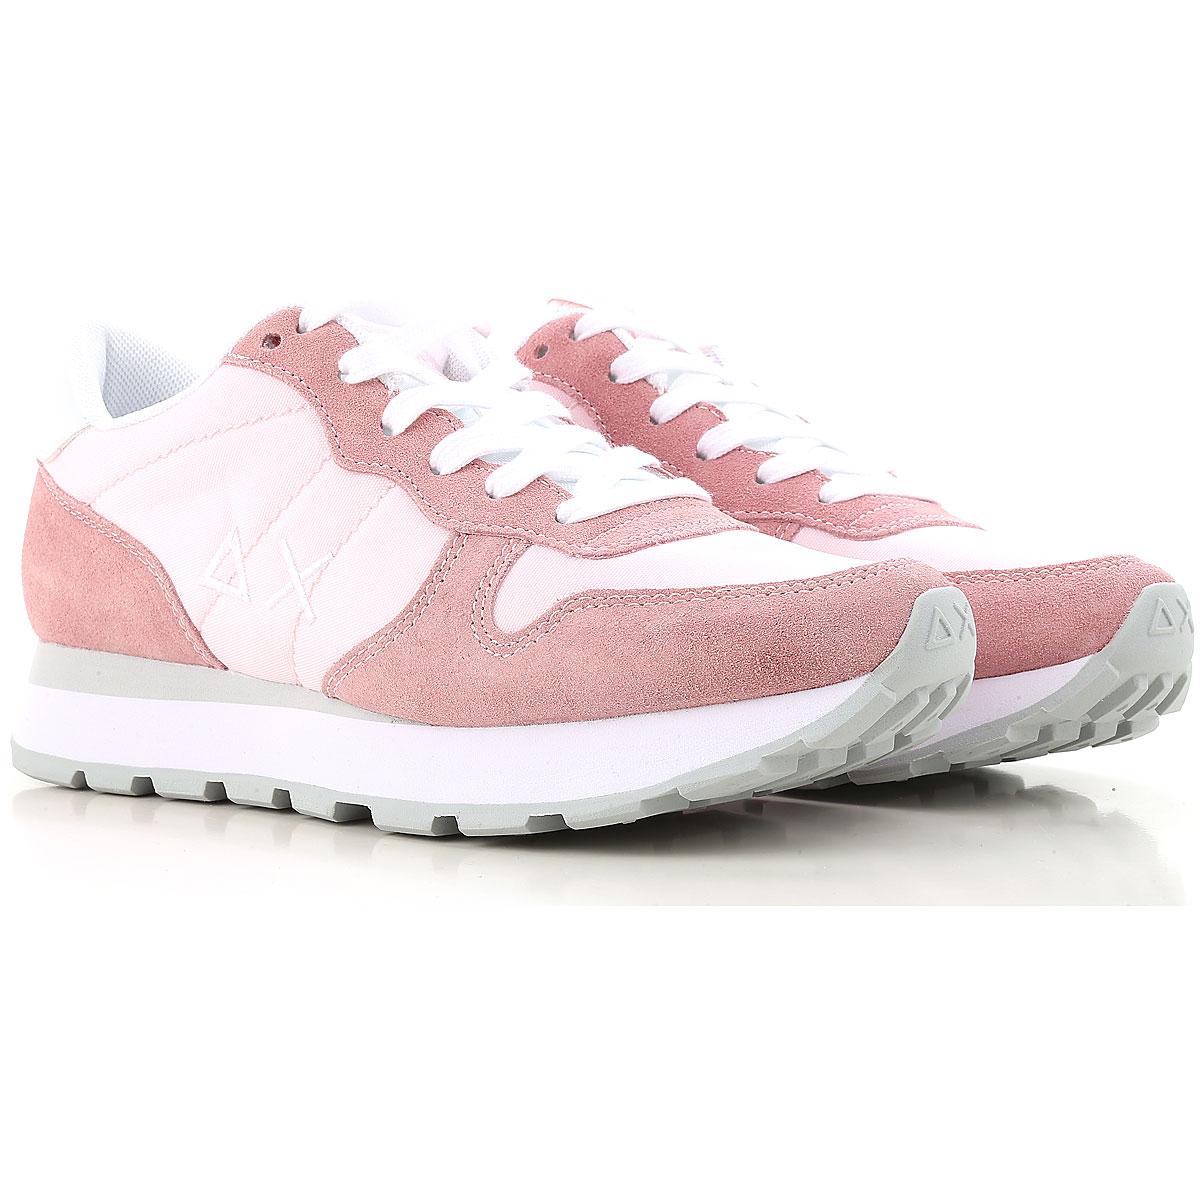 a0b390507d2 Chaussures Sun 68 roses femme Q2dn4m6 - sixty.messouvenirsphoto.fr